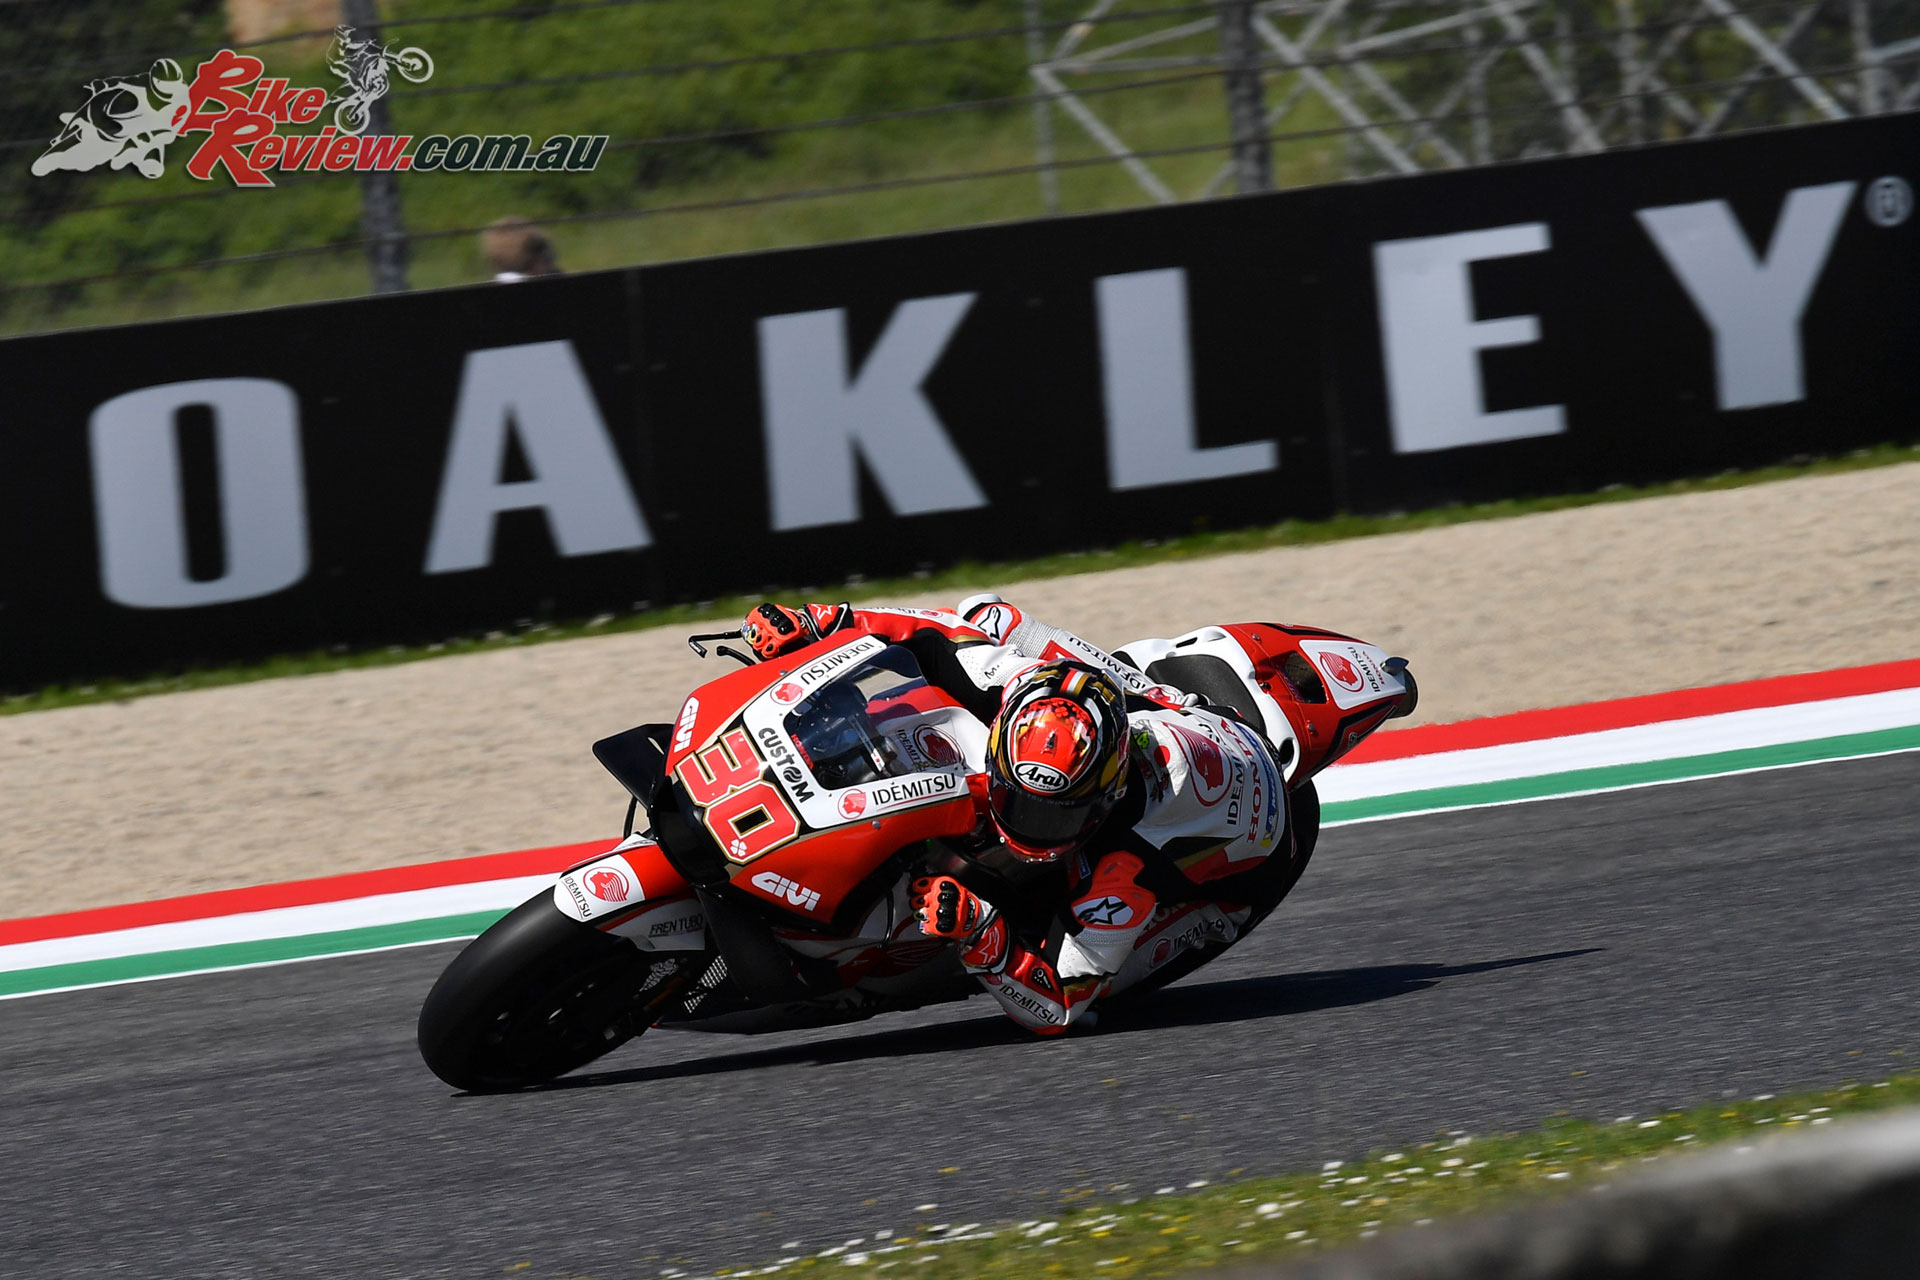 Takaaki Nakagami - 2019 MotoGP Round 6 Mugello